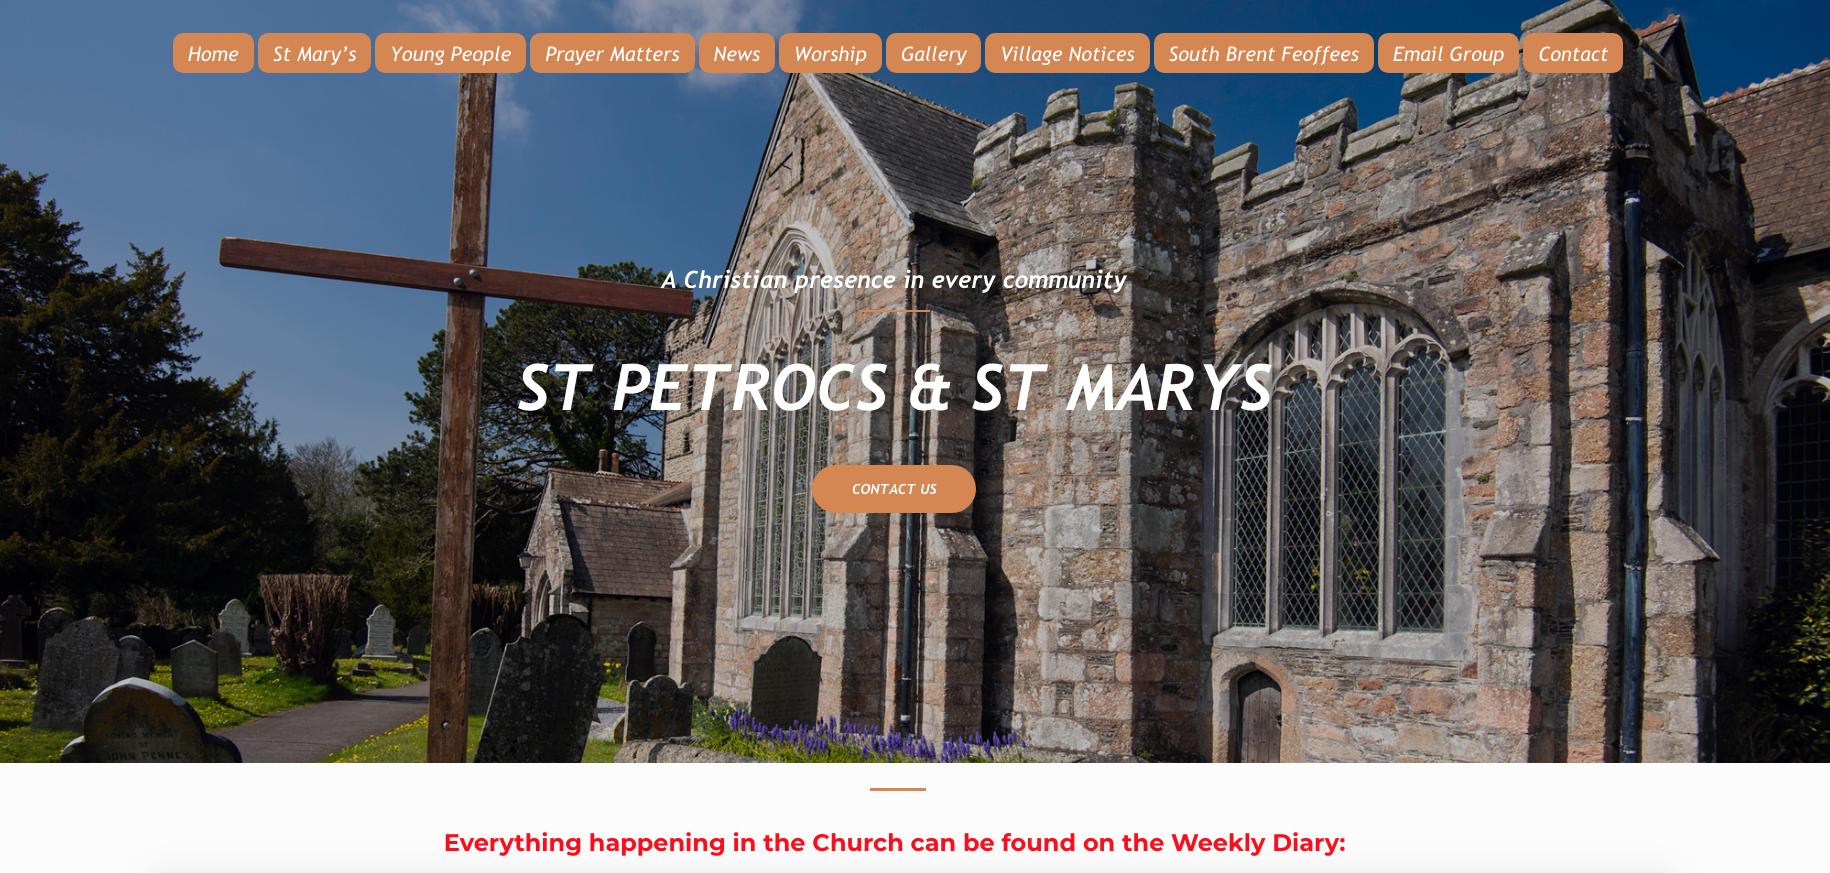 St Petroc's